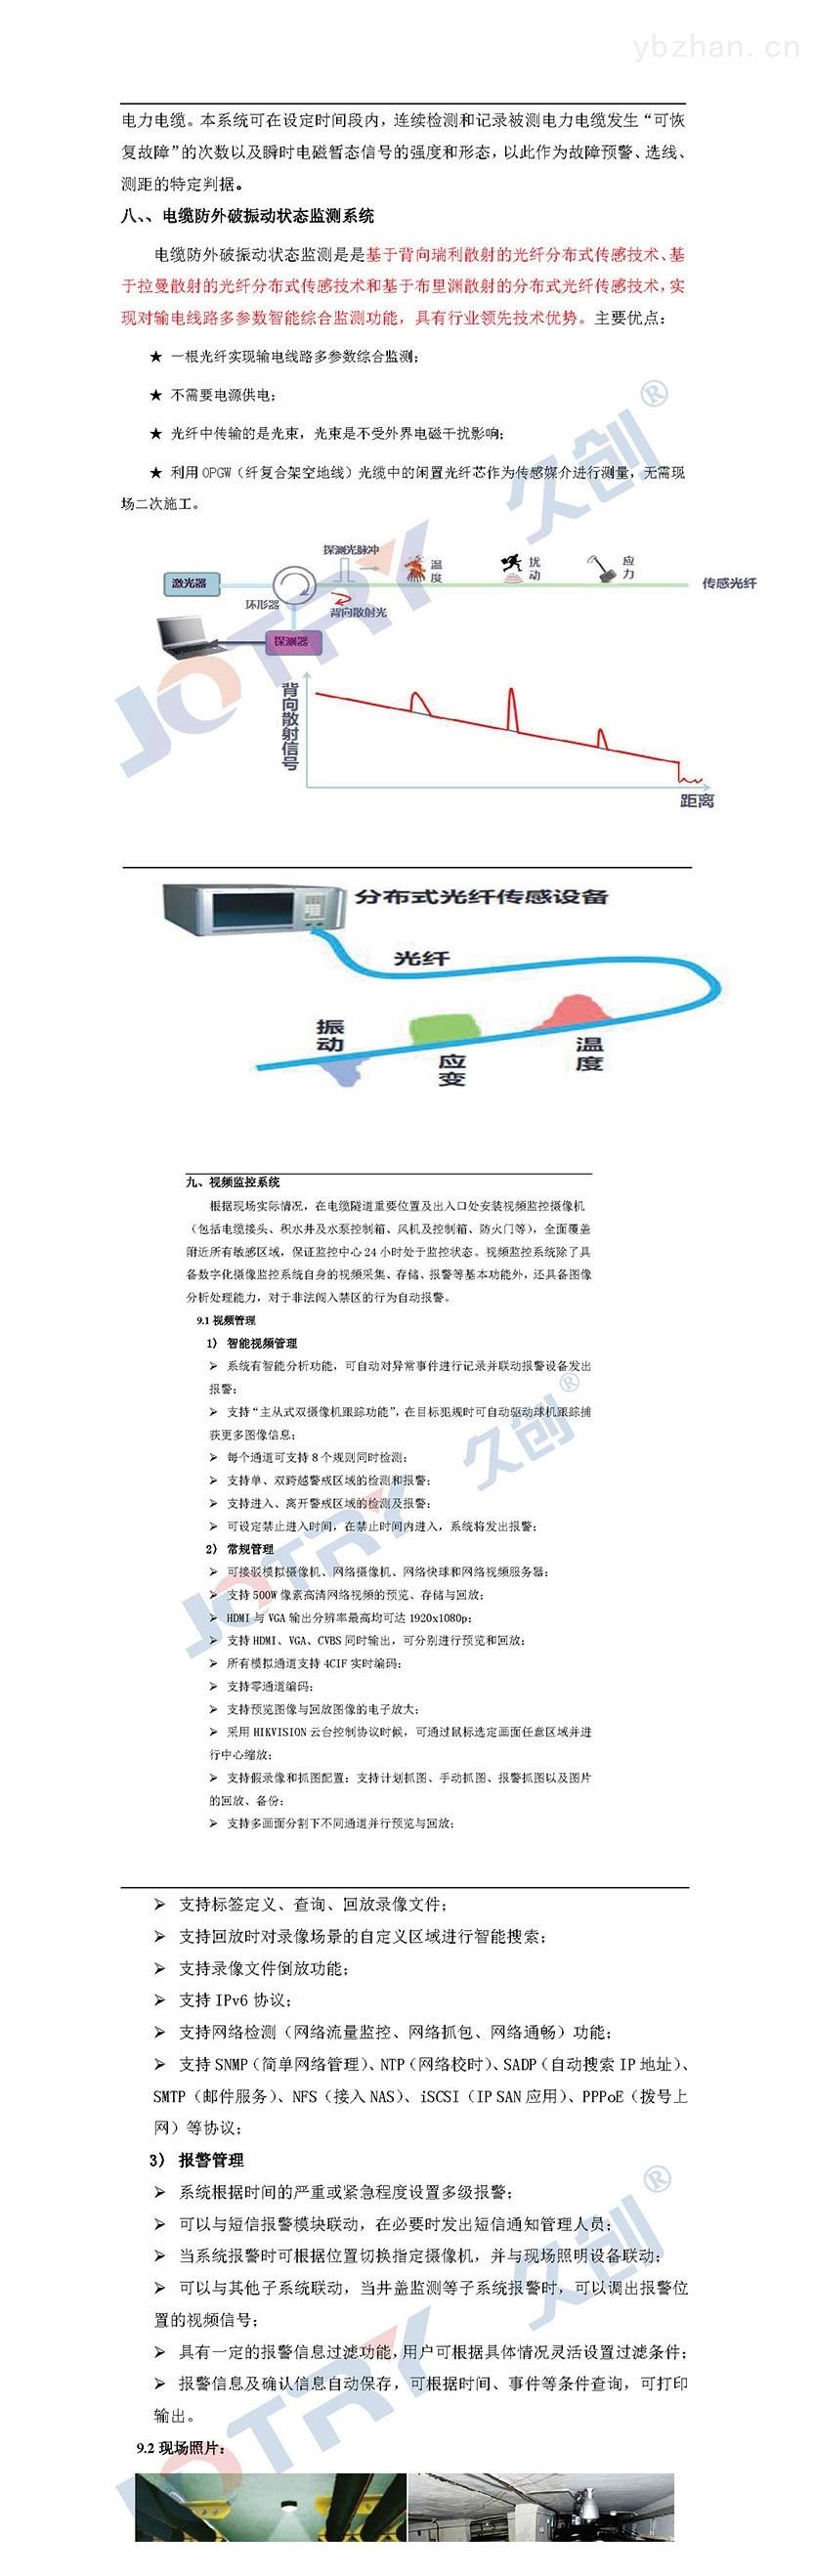 <strong>电缆隧道综合监控系统</strong>02-恢复的04_01.jpg